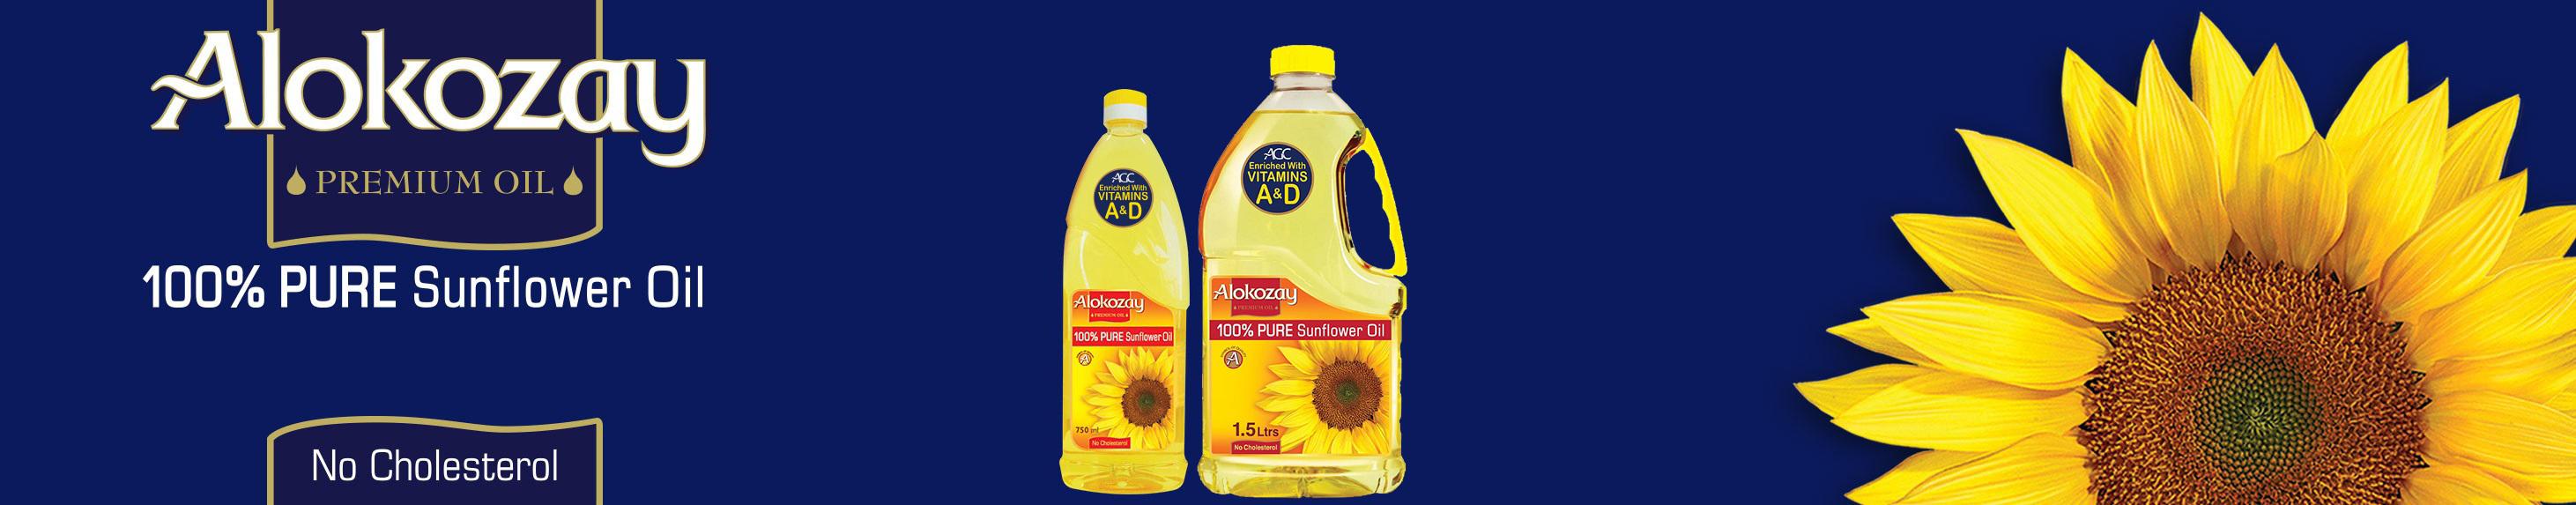 Alokozay Sunflower Oil